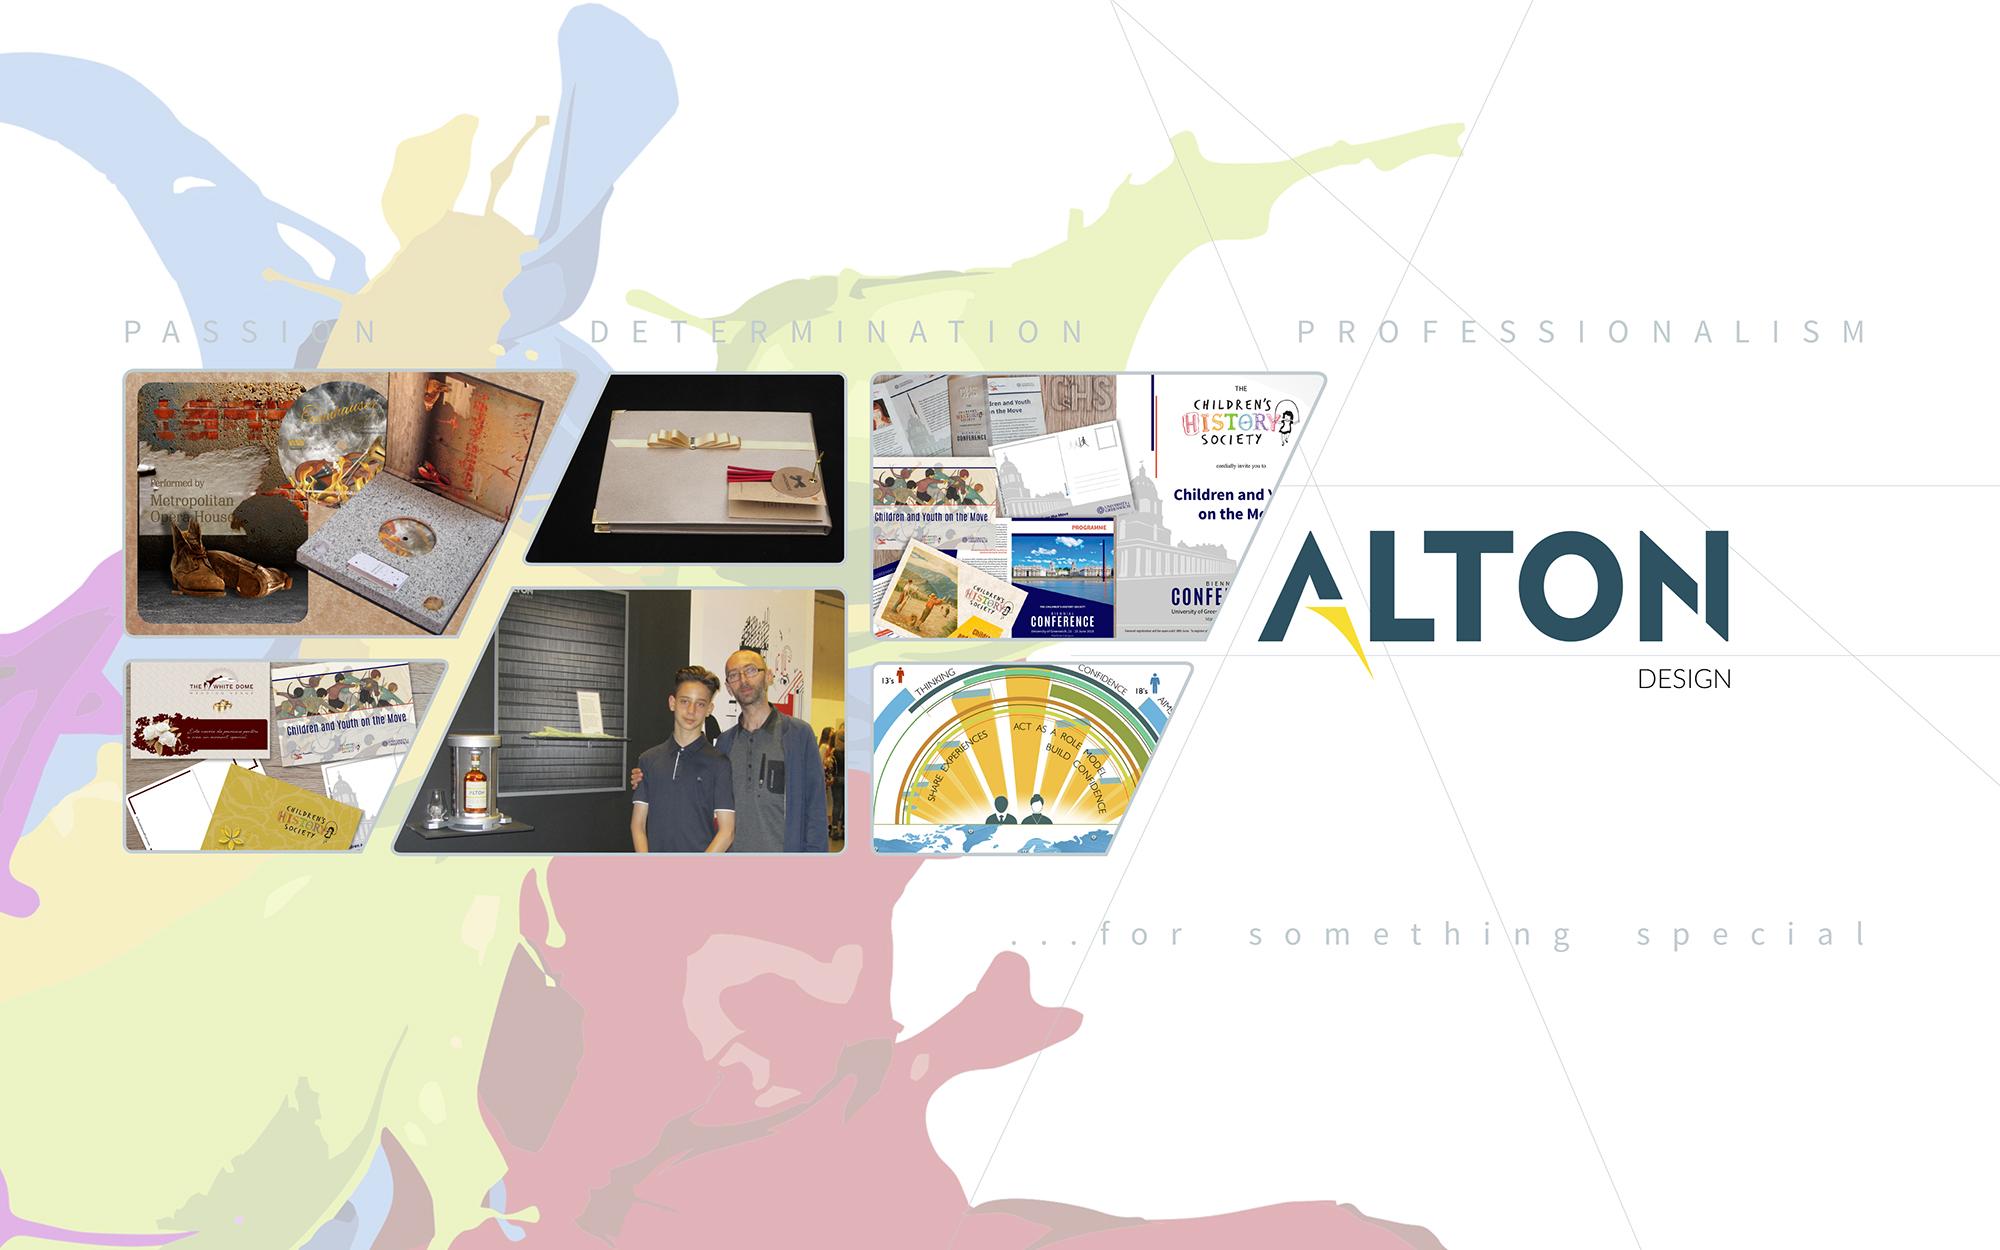 Alton Design